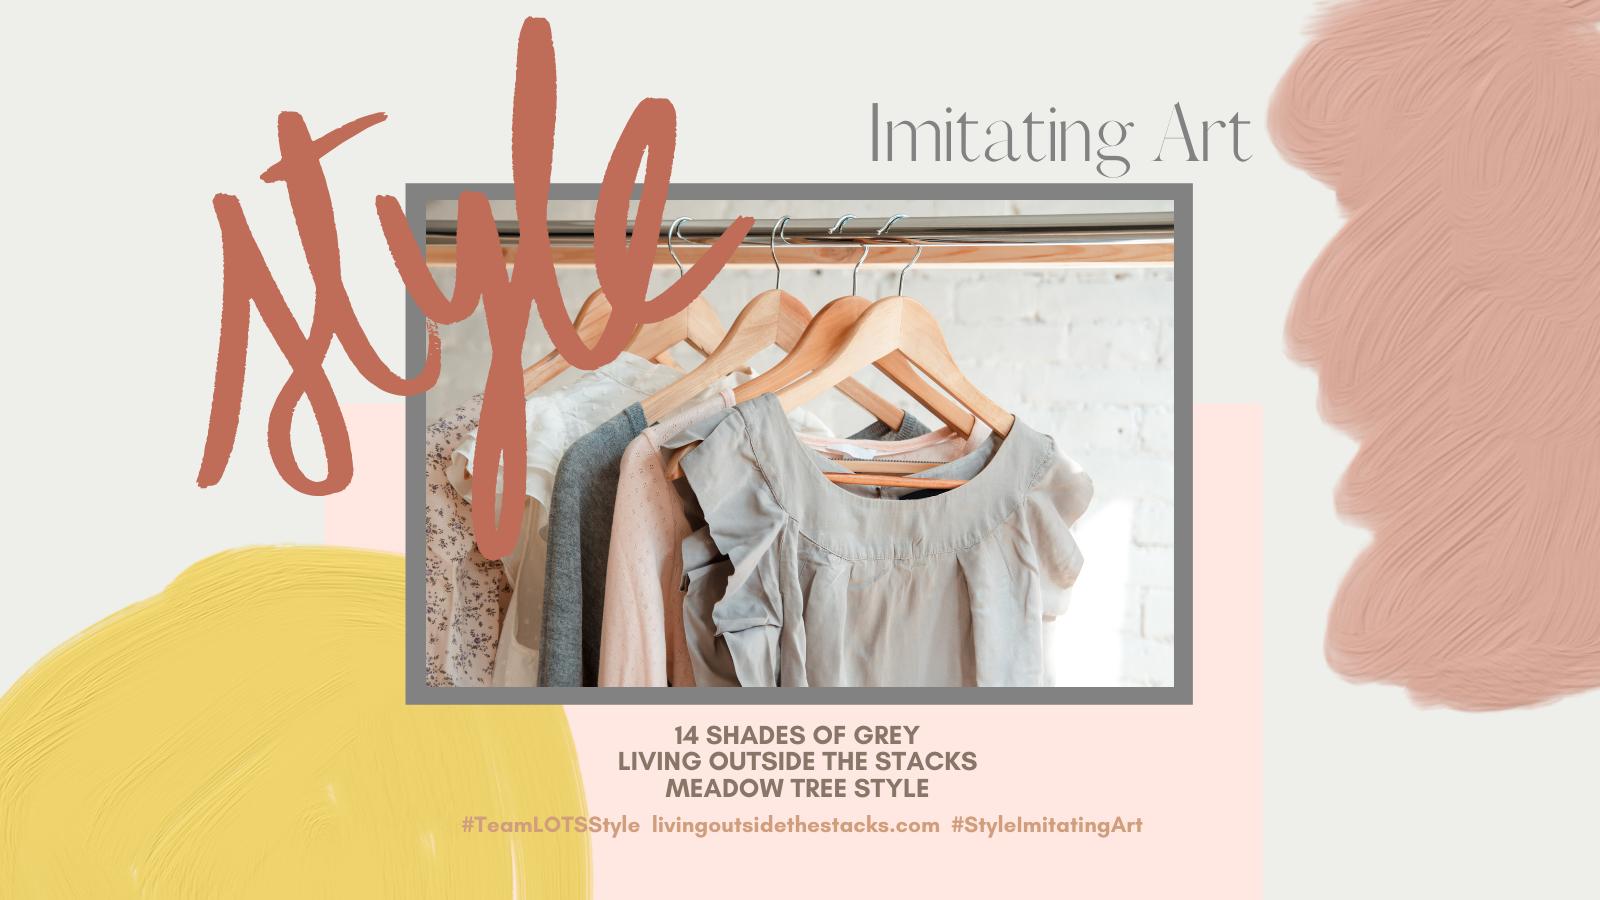 Style Imitating Art {living outside the stacks} follow me on Instagram @DaenelT #TeamLOTSStyle and #StyleImitatingArt